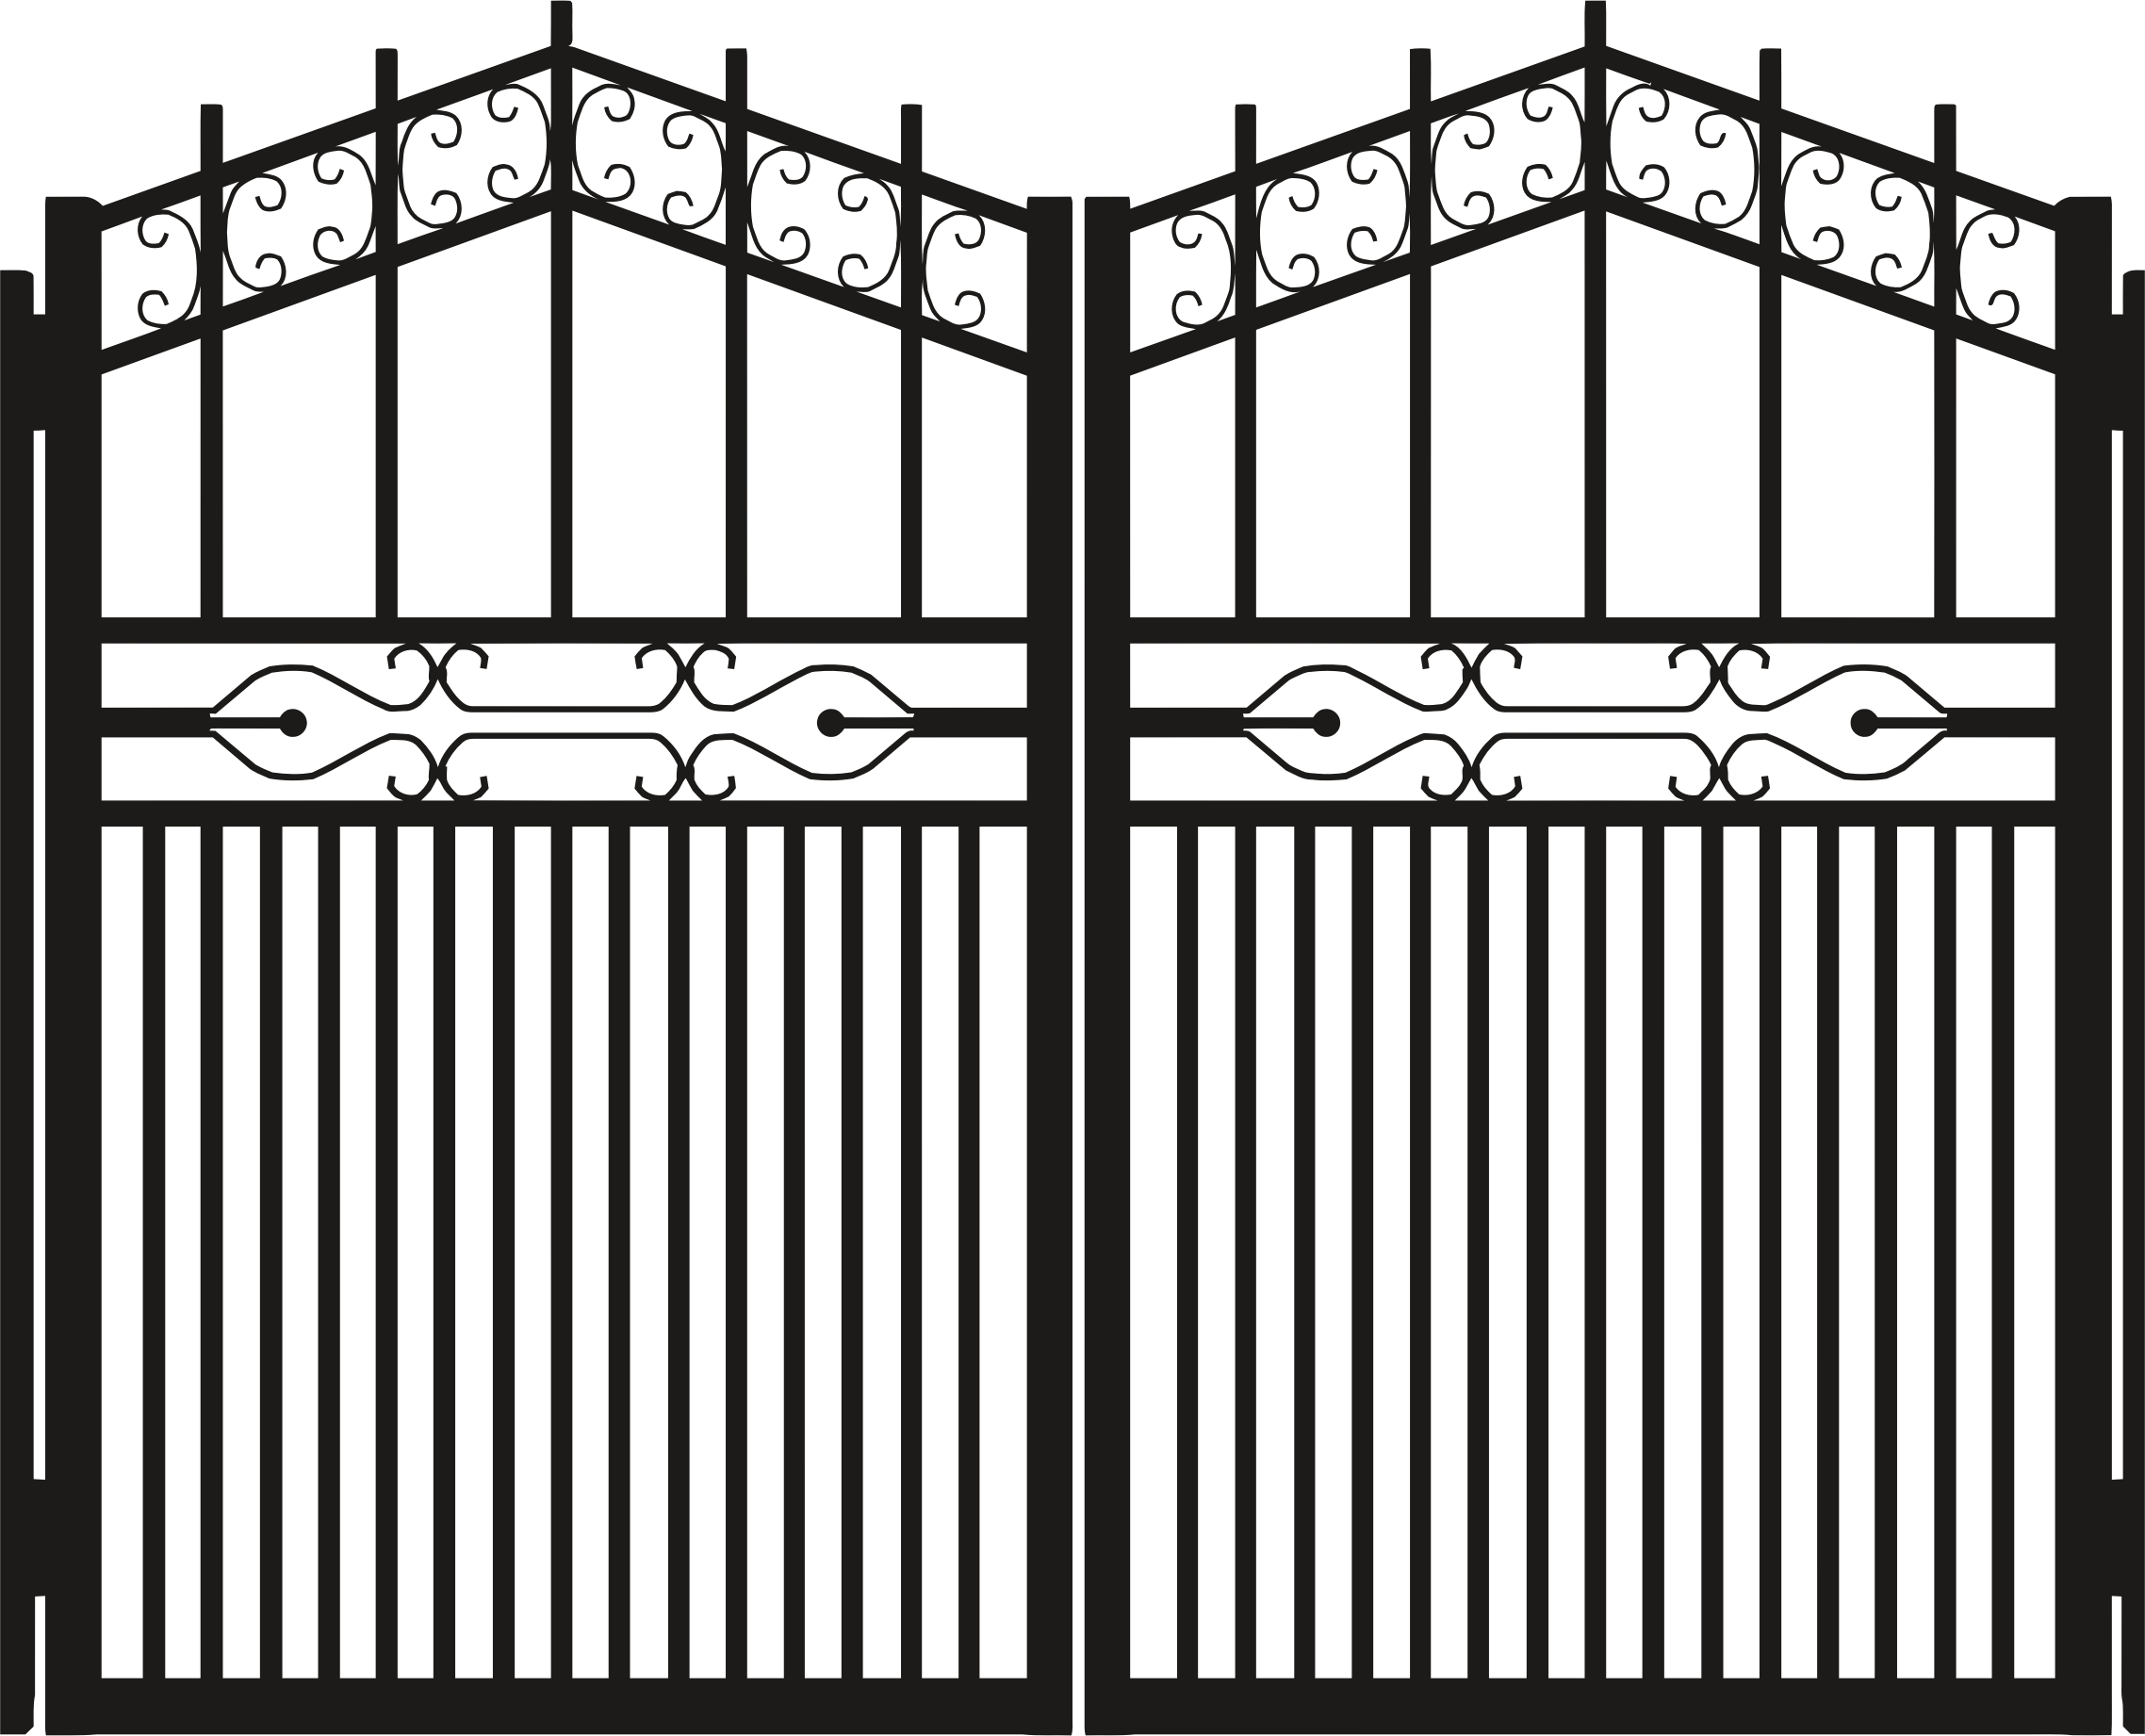 Gate clipart iron gate Iron Gate Silhouette Silhouette Clipart